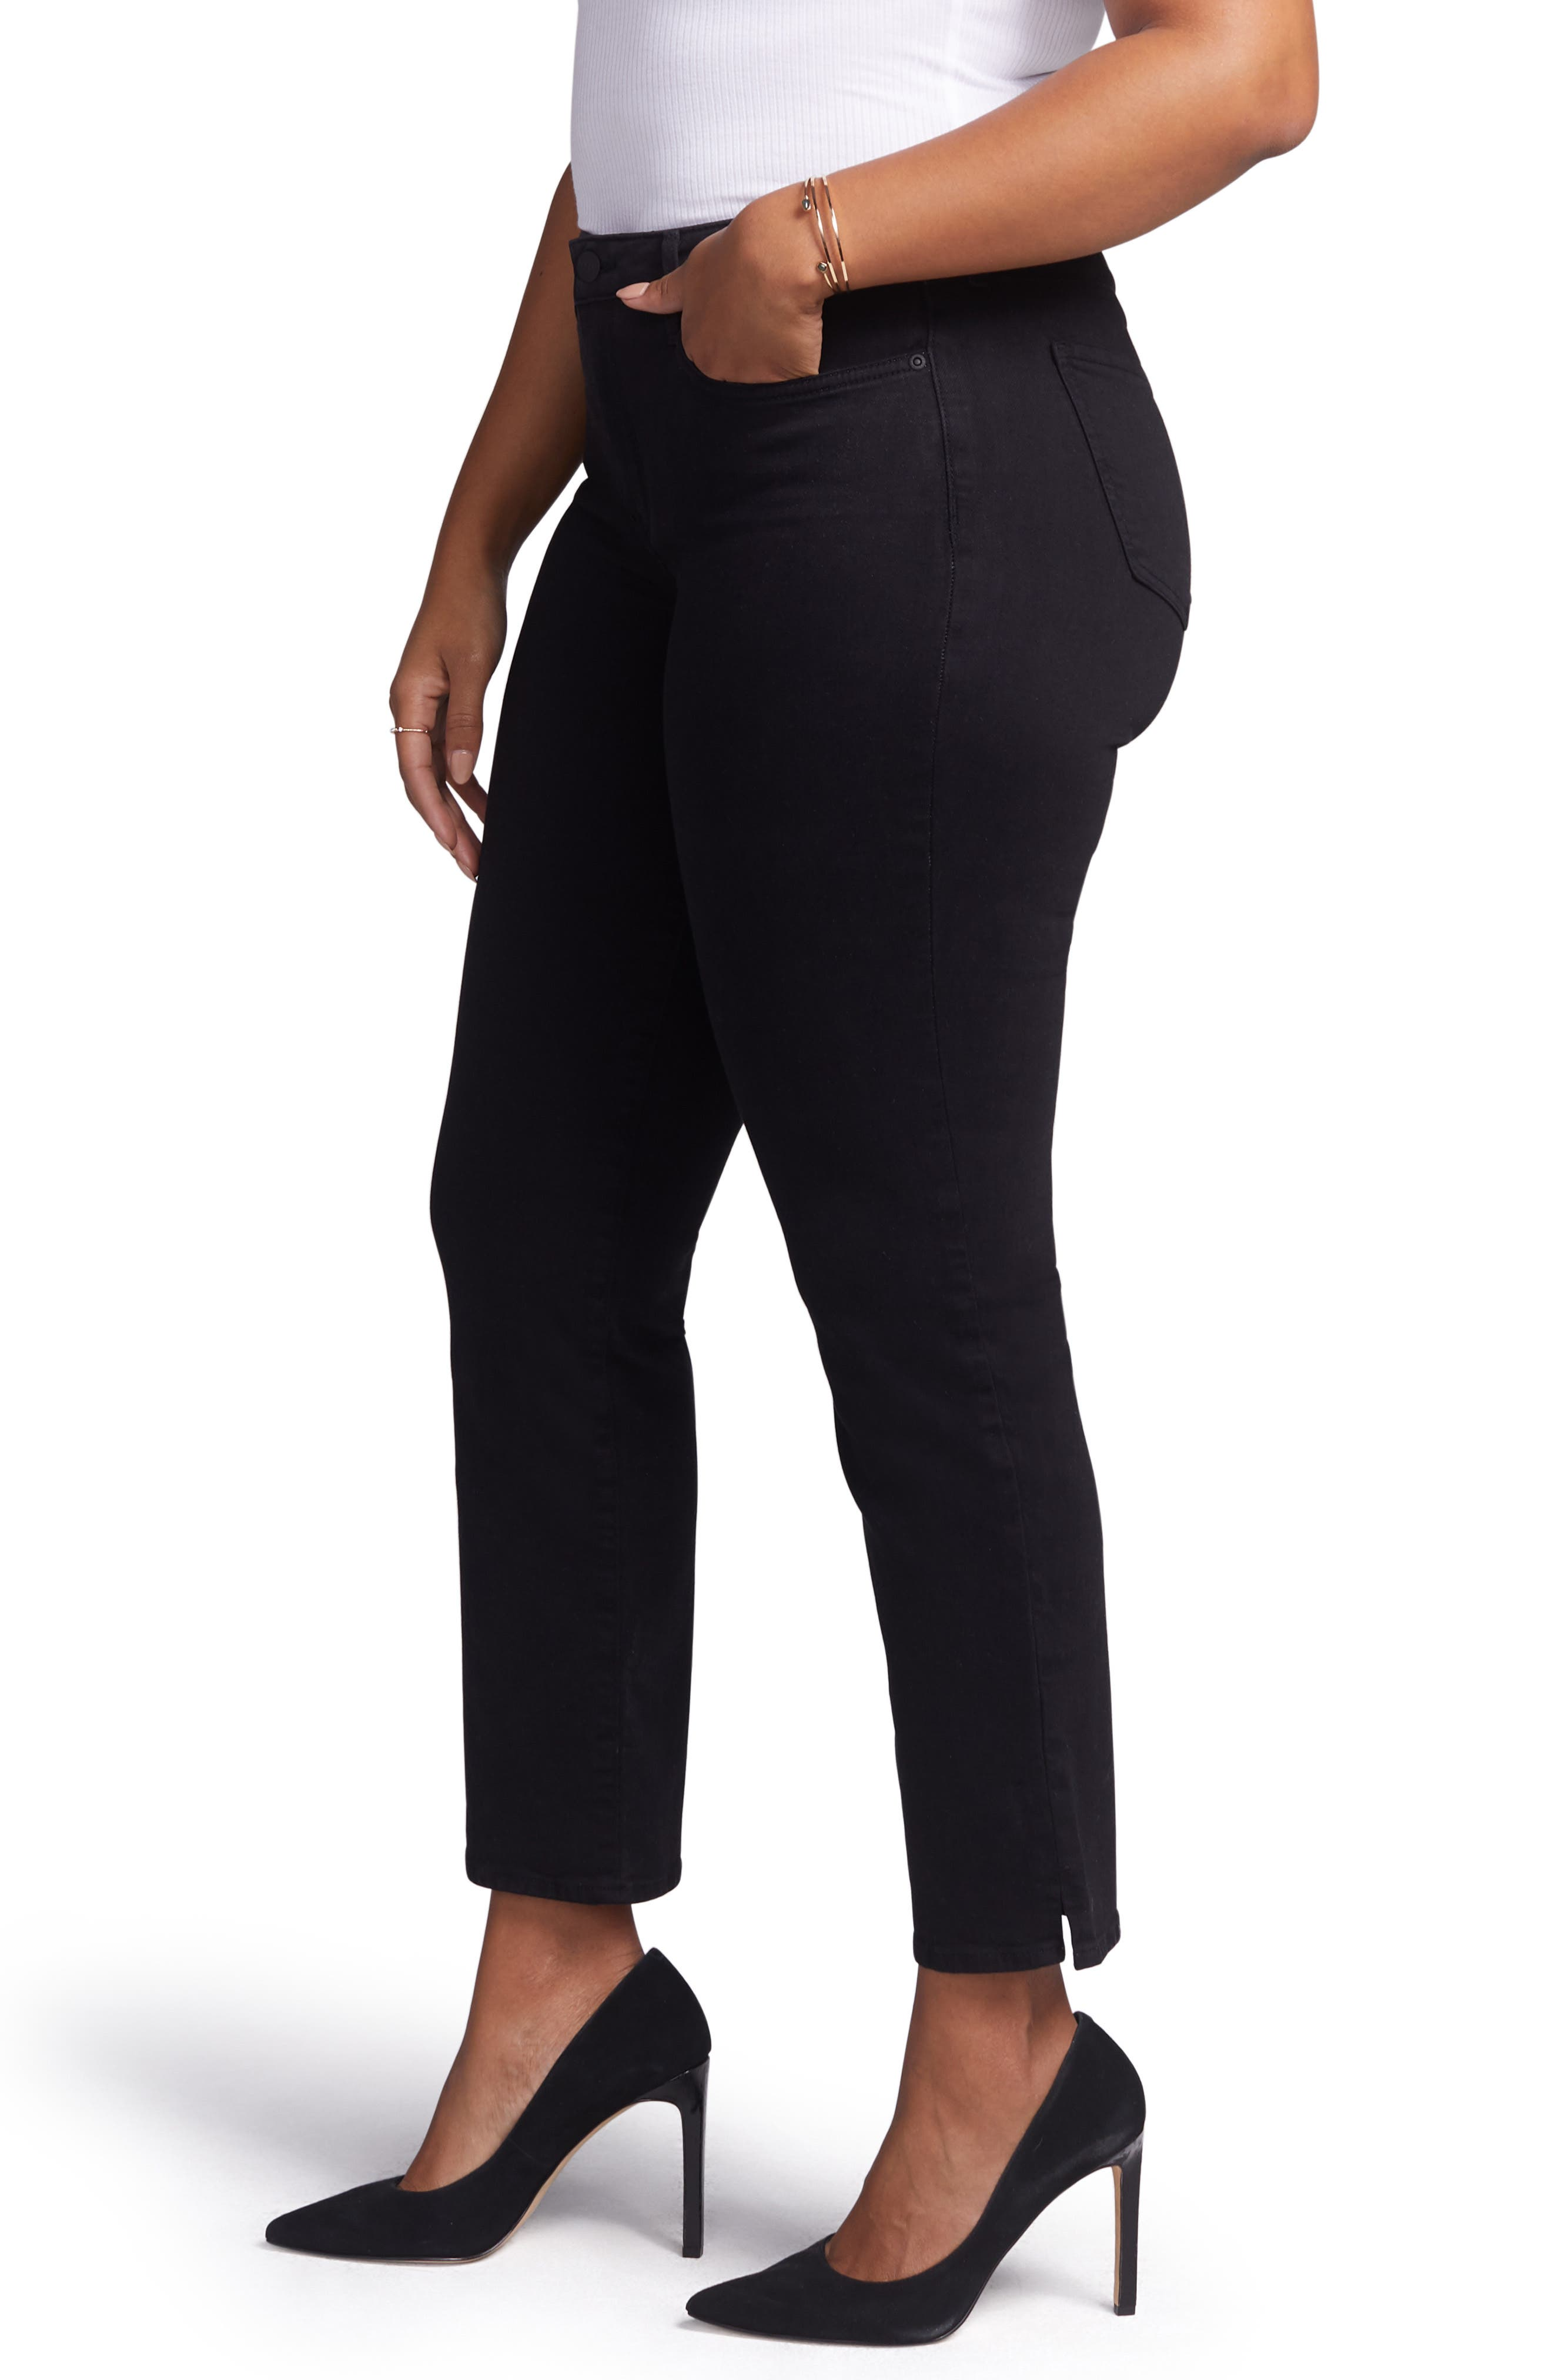 CURVES 360 BY NYDJ,                             Slim Straight Leg Ankle Jeans,                             Alternate thumbnail 3, color,                             BLACK